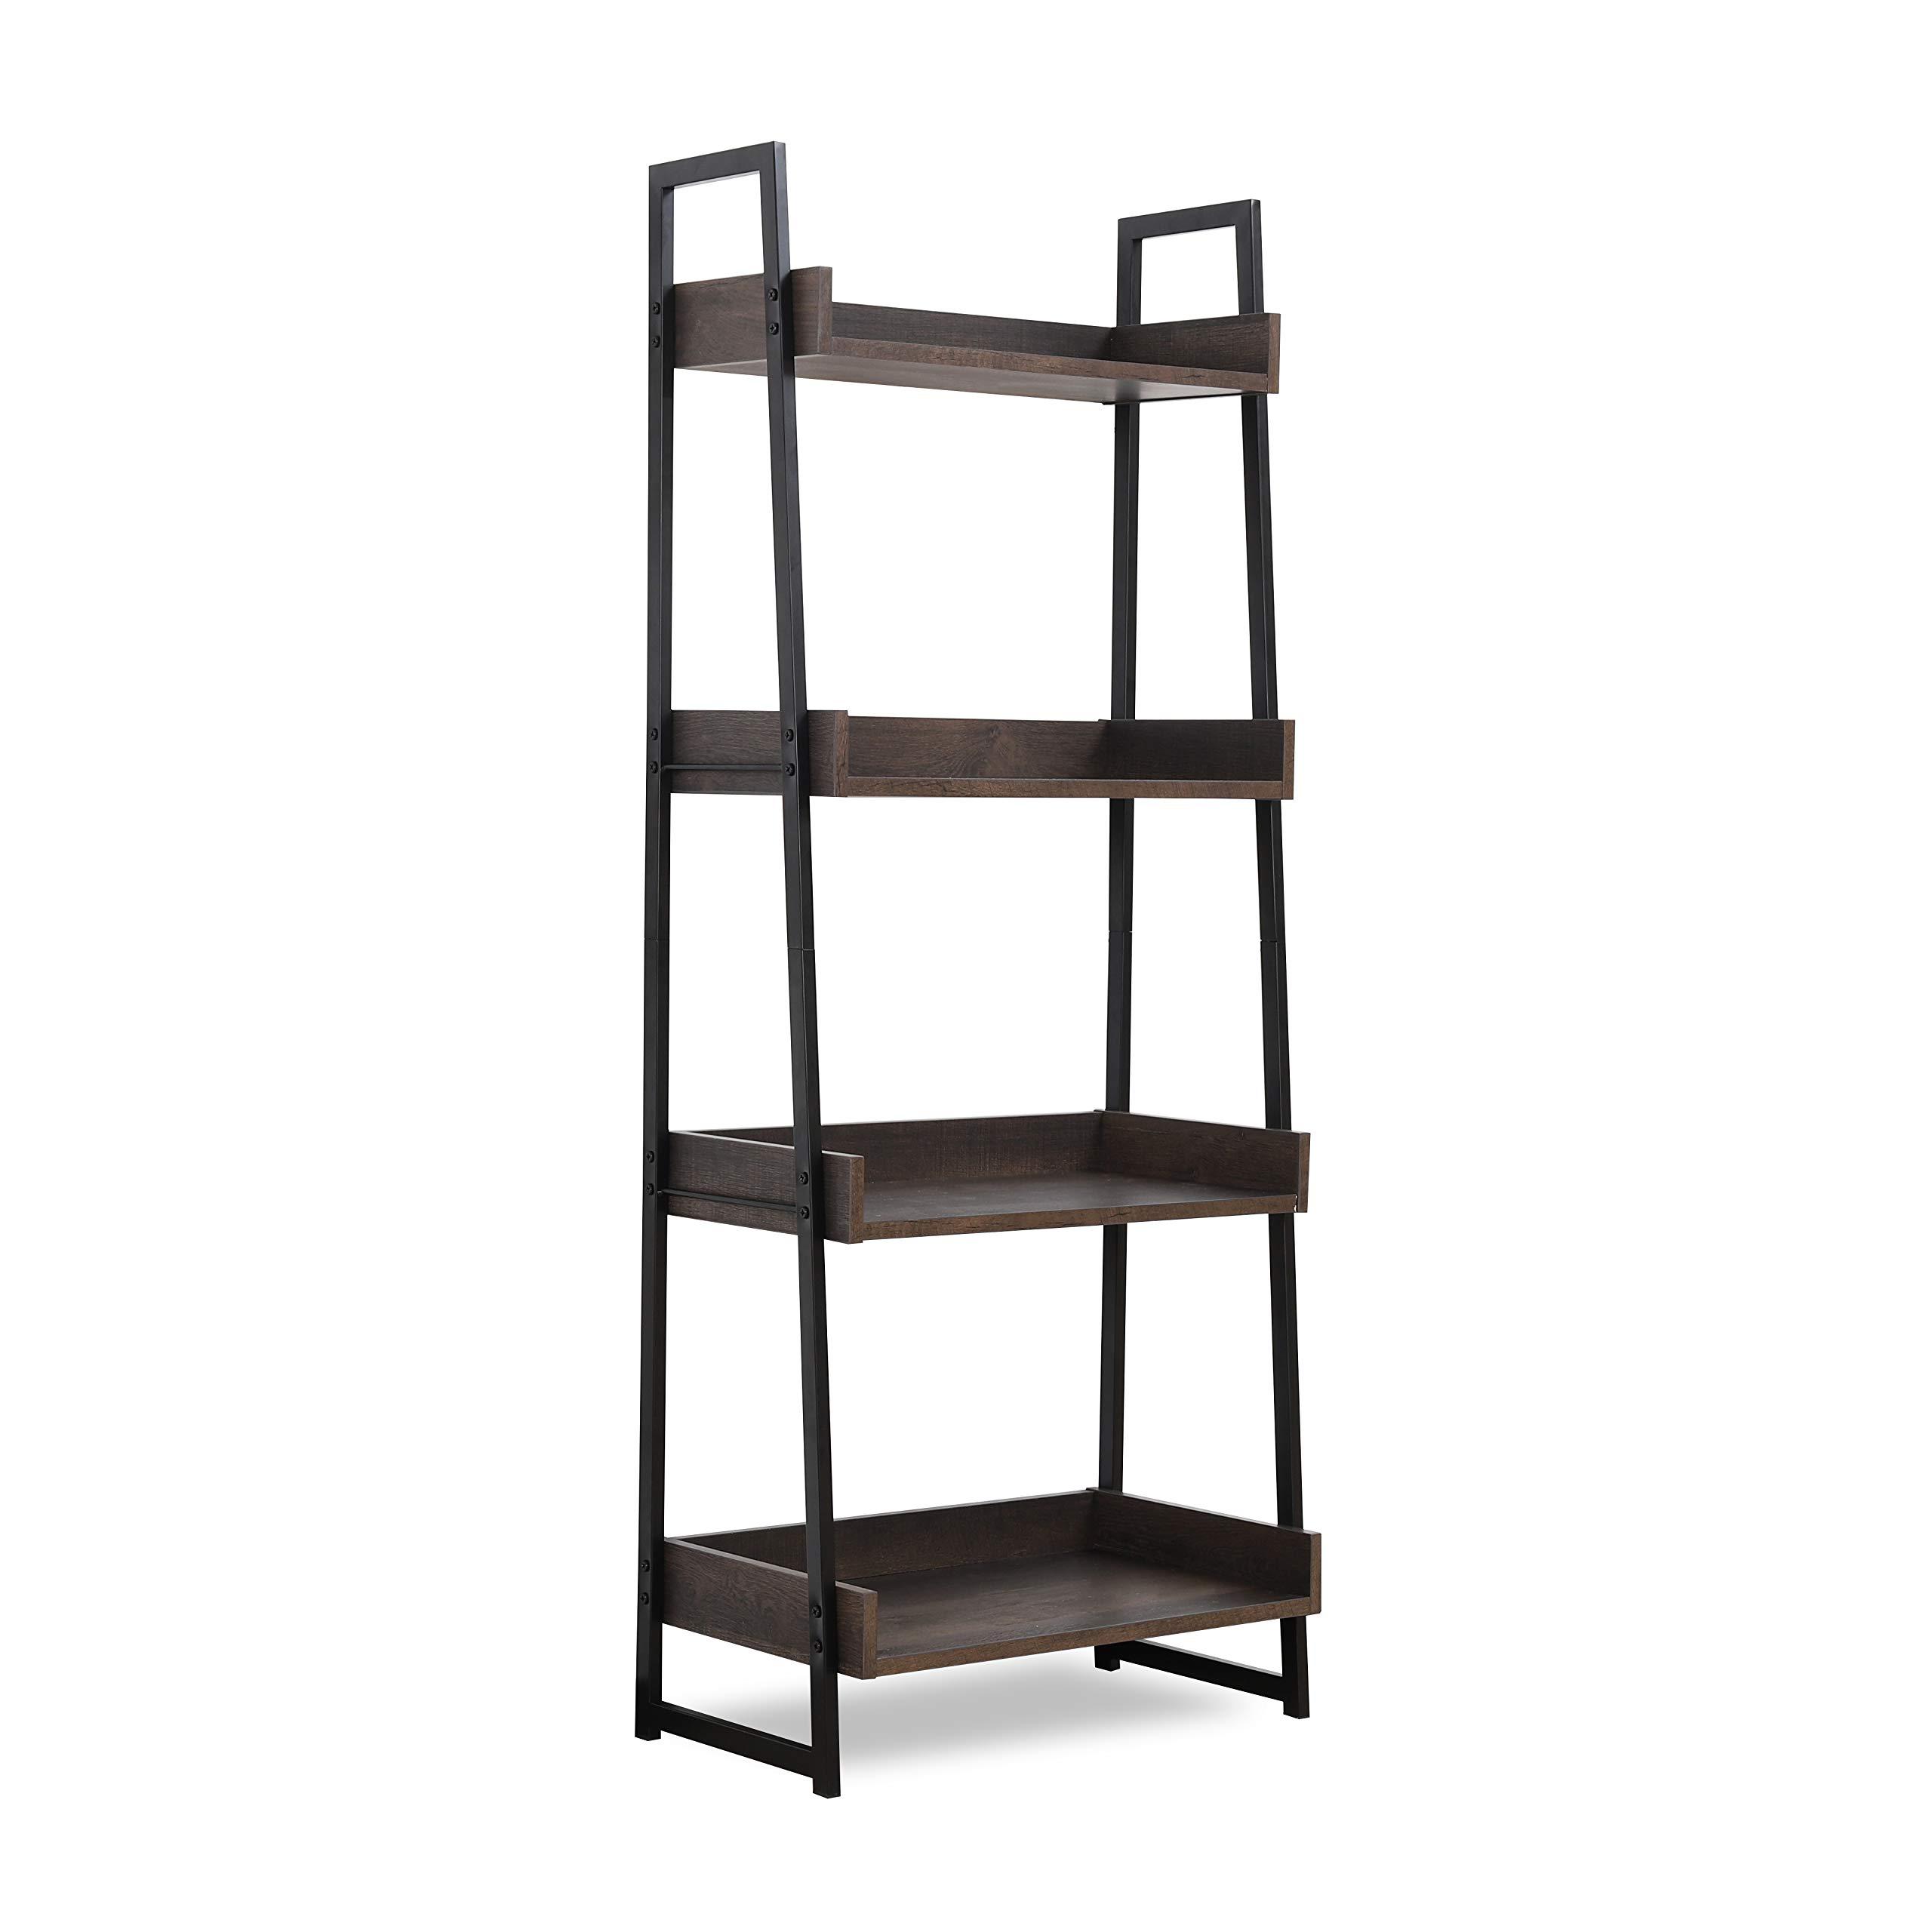 Sekey Home Ladder Shelf, 4-Tier Bookshelf   Book Case, Storage Rack Shelf Unit, Bathroom, Living Room, Wood Look Accent Furniture Metal Frame,Smoky Oak by Sekey